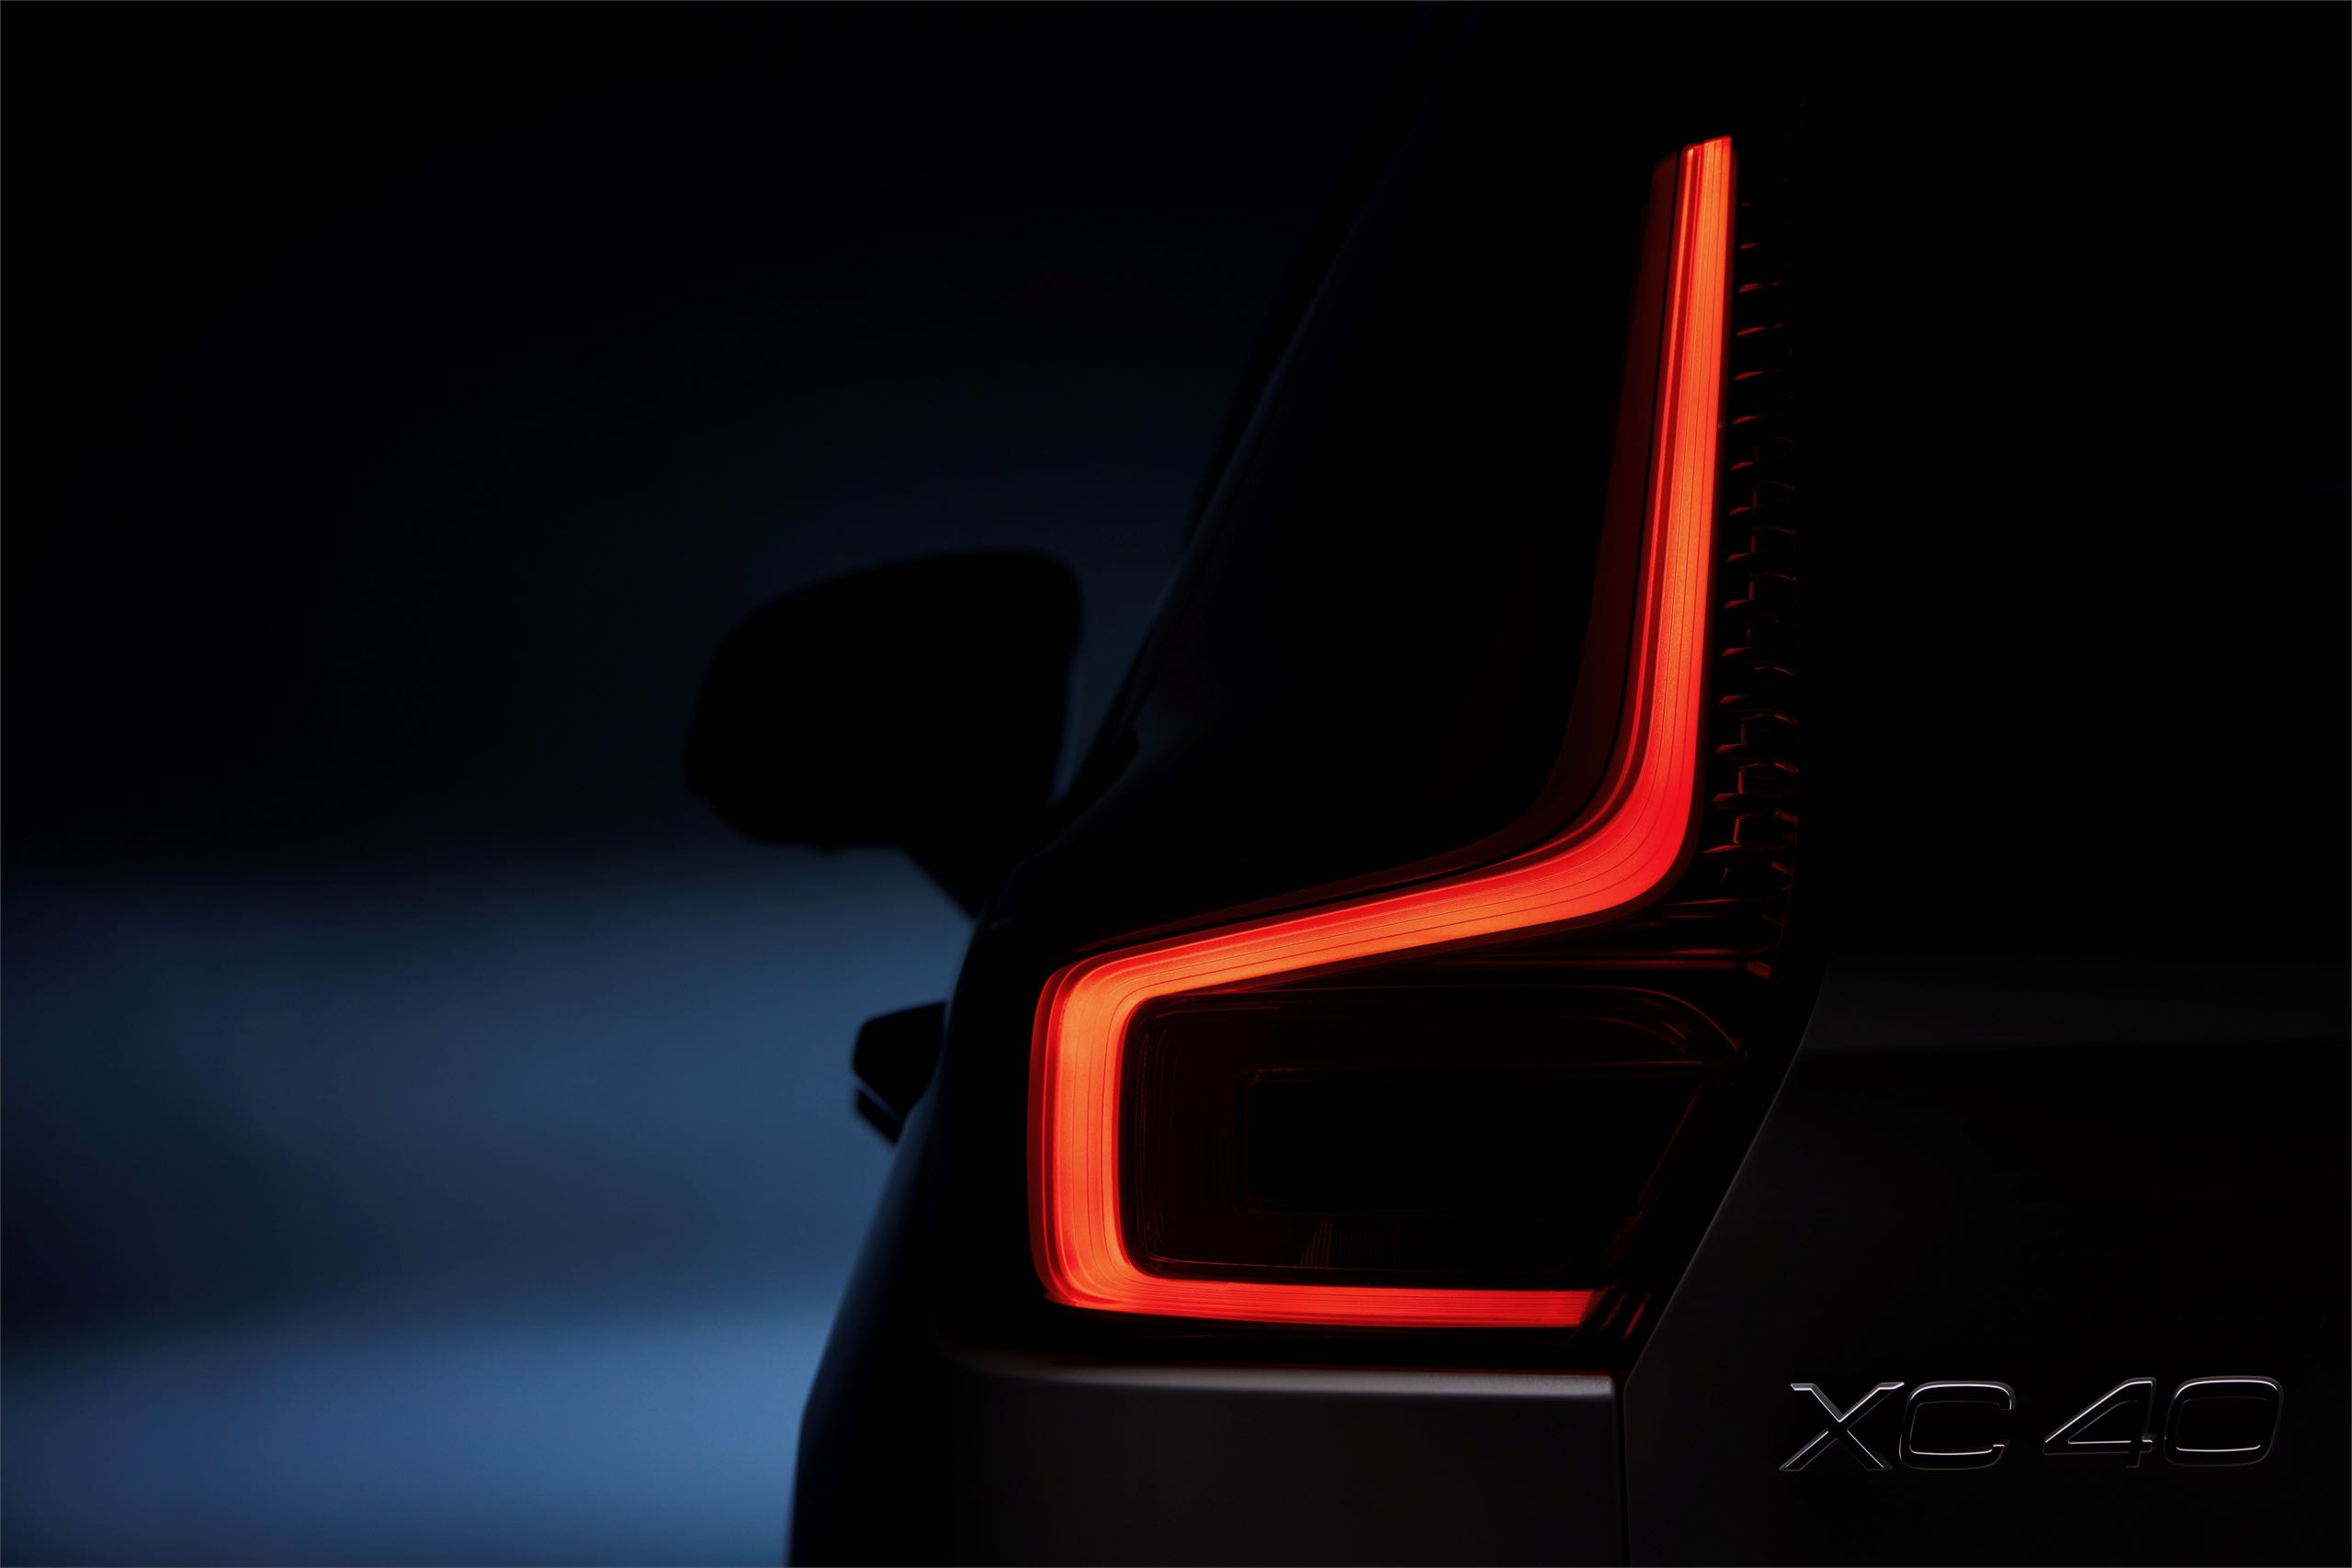 2018 XC40 -  2017, 2018, 2018 New XC40, Design, Detail, Exterior, Images, New XC40